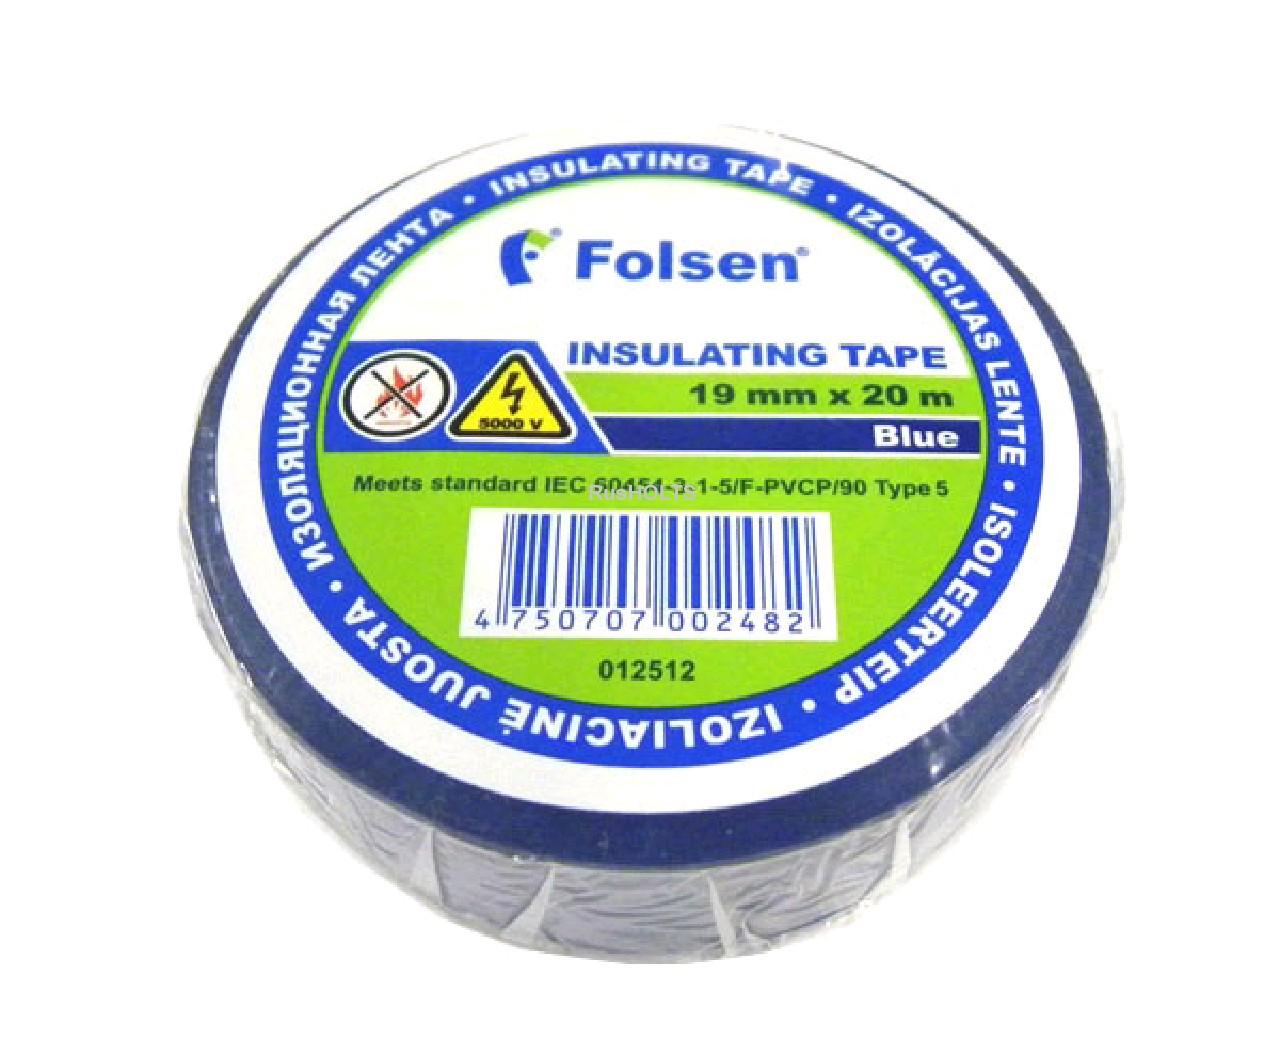 Изоляционная лента Folsen 19мм x 20м, пламягасящая